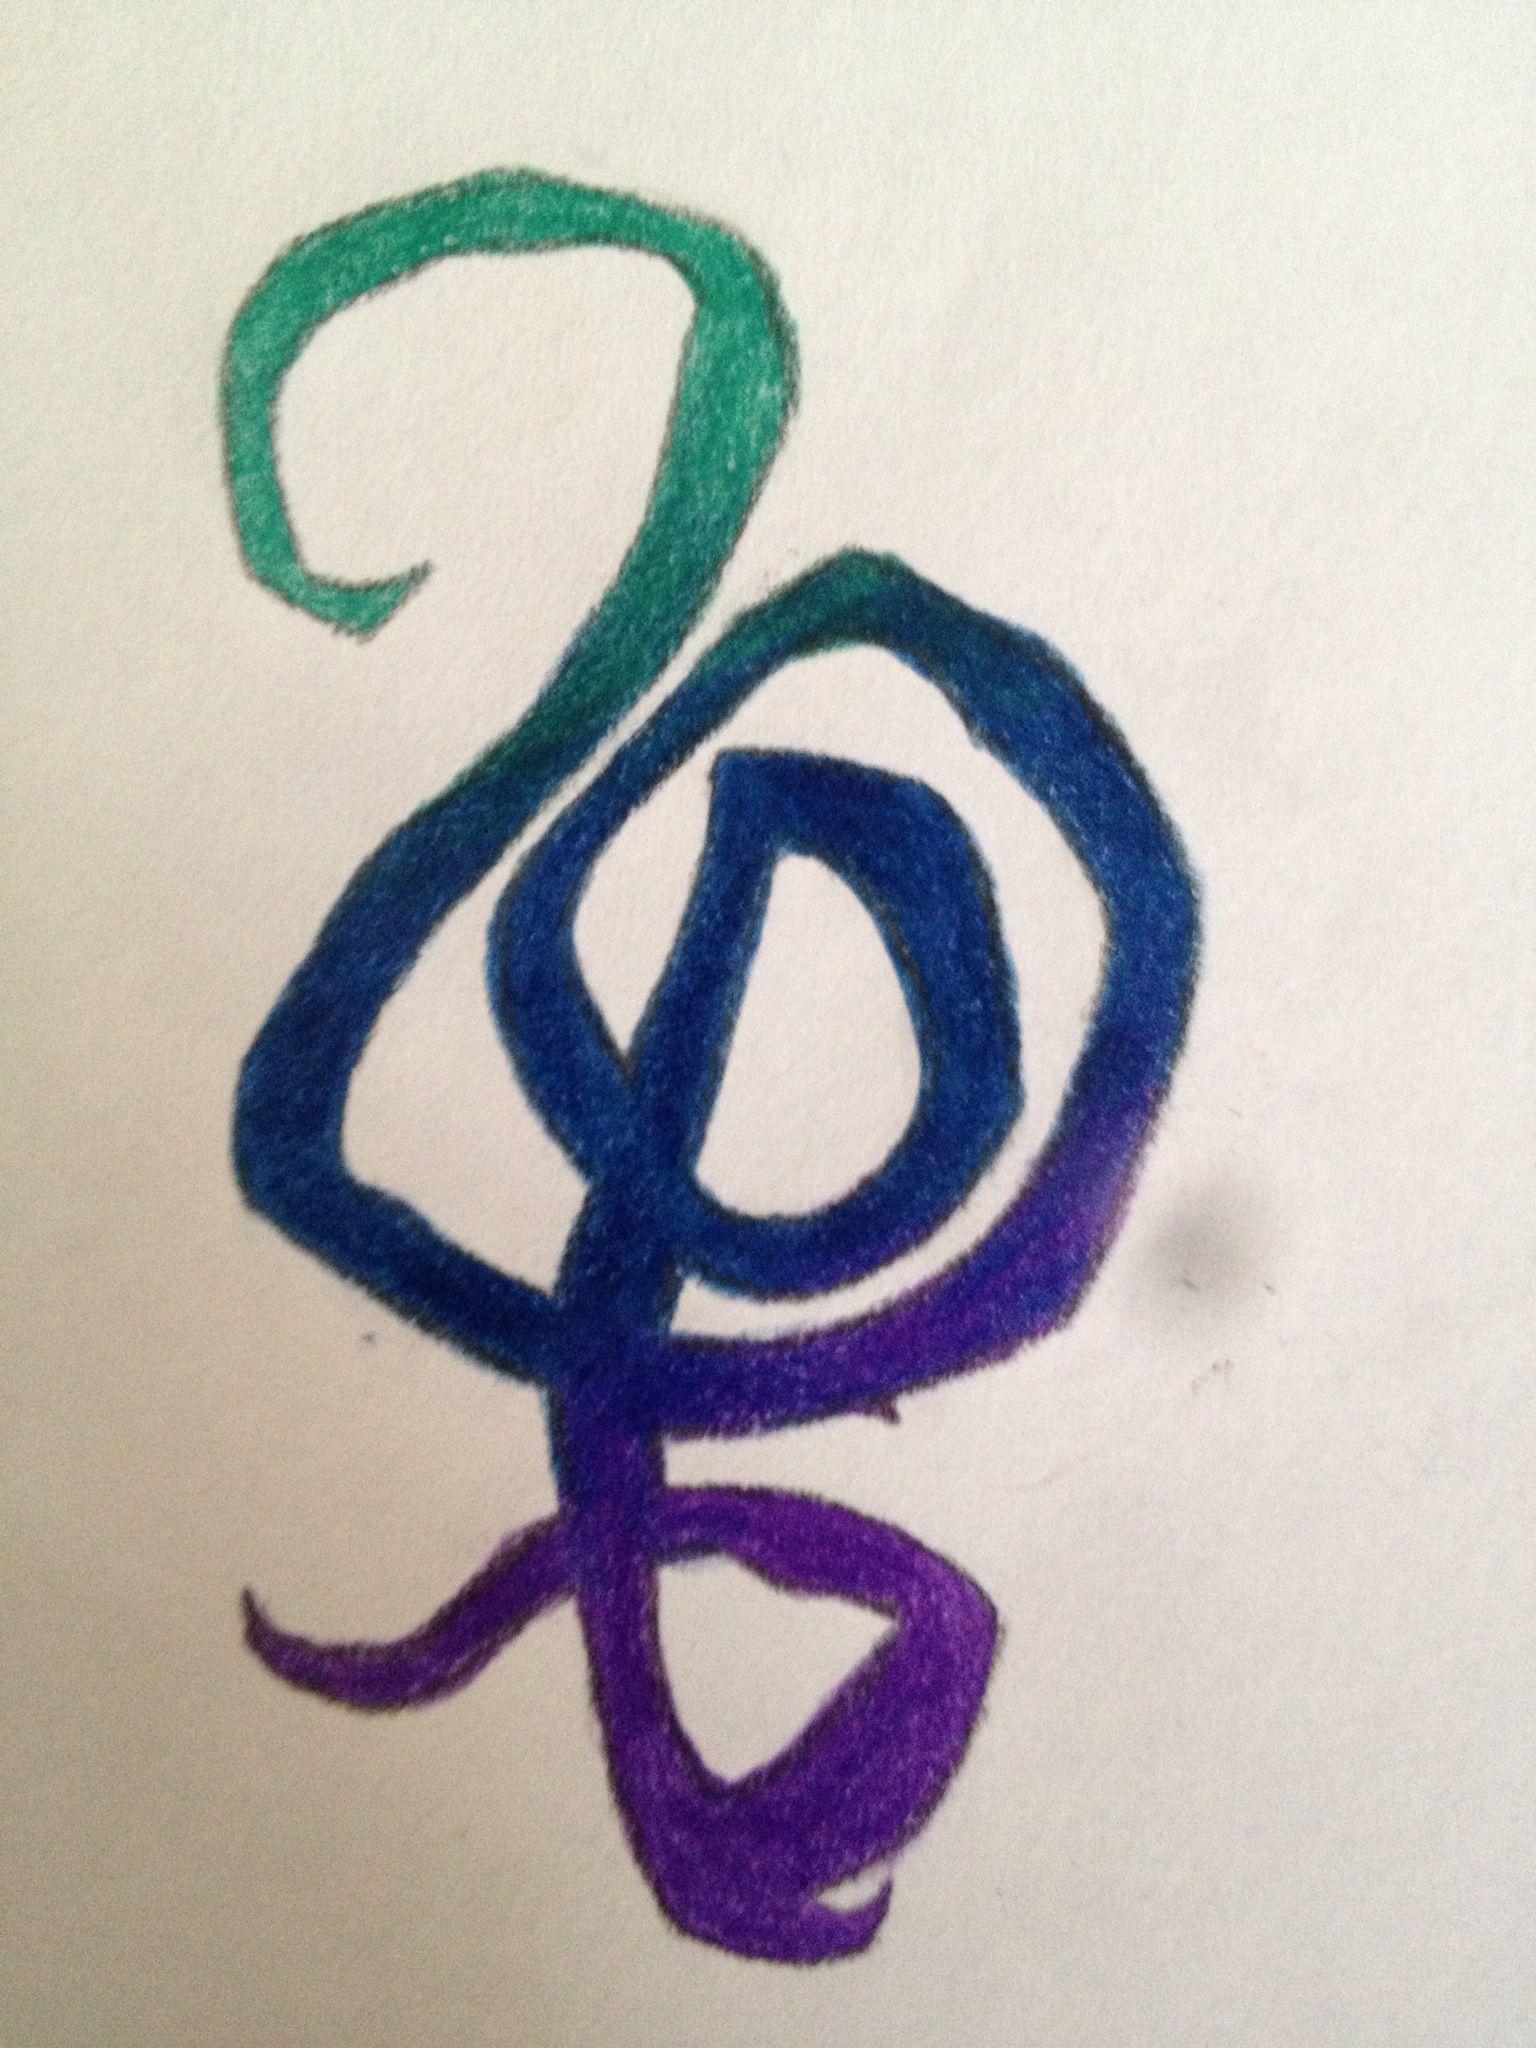 Hakuna matata symbol tattoo drawn by my daughter ink pinterest hakuna matata symbol tattoo drawn by my daughter buycottarizona Images